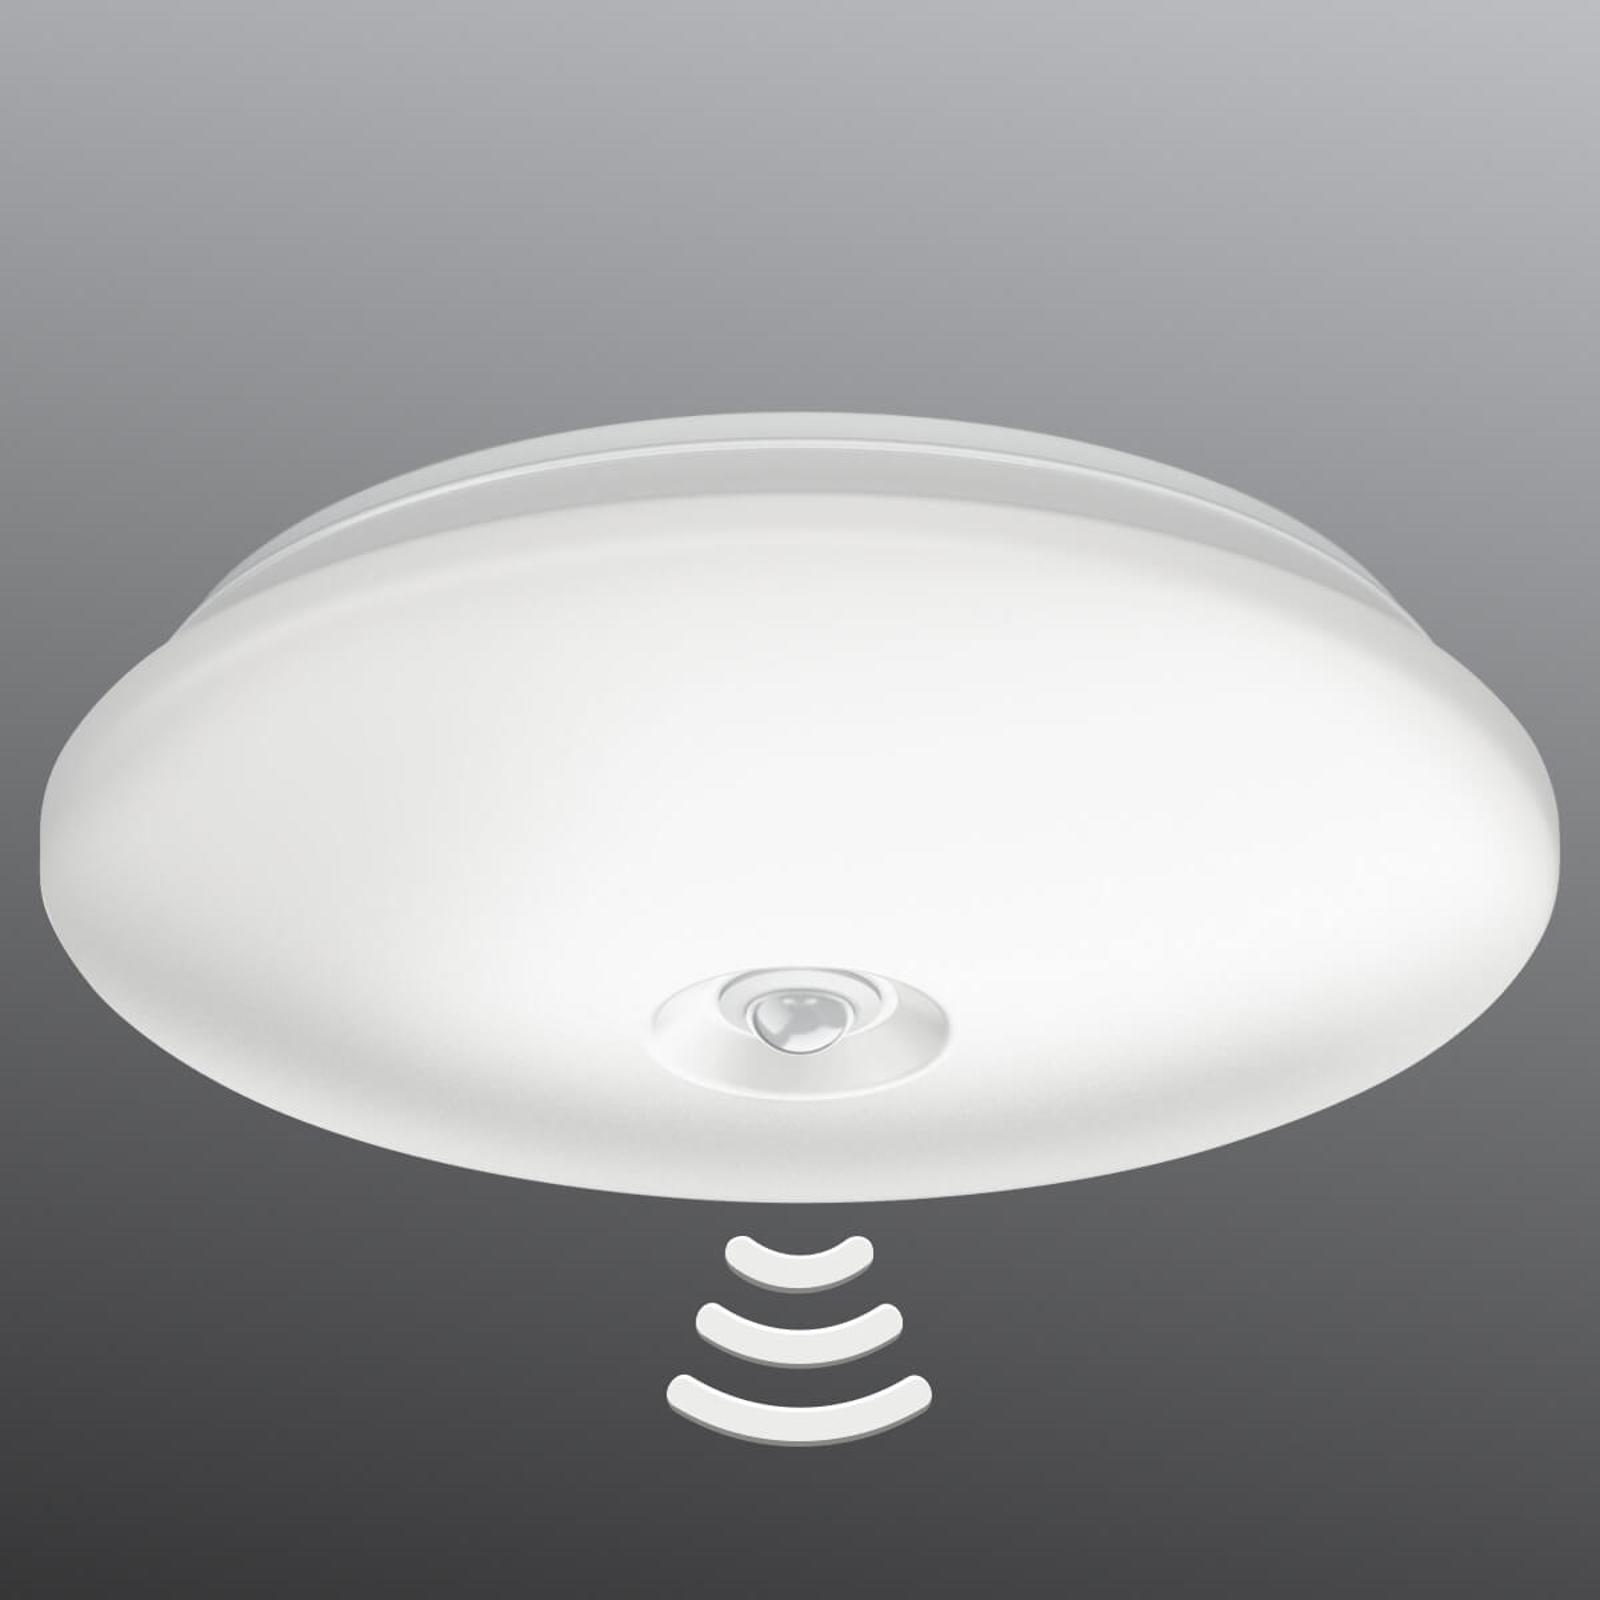 Philips Mauve LED-Deckenleuchte IR-Sensor 32 cm kaufen